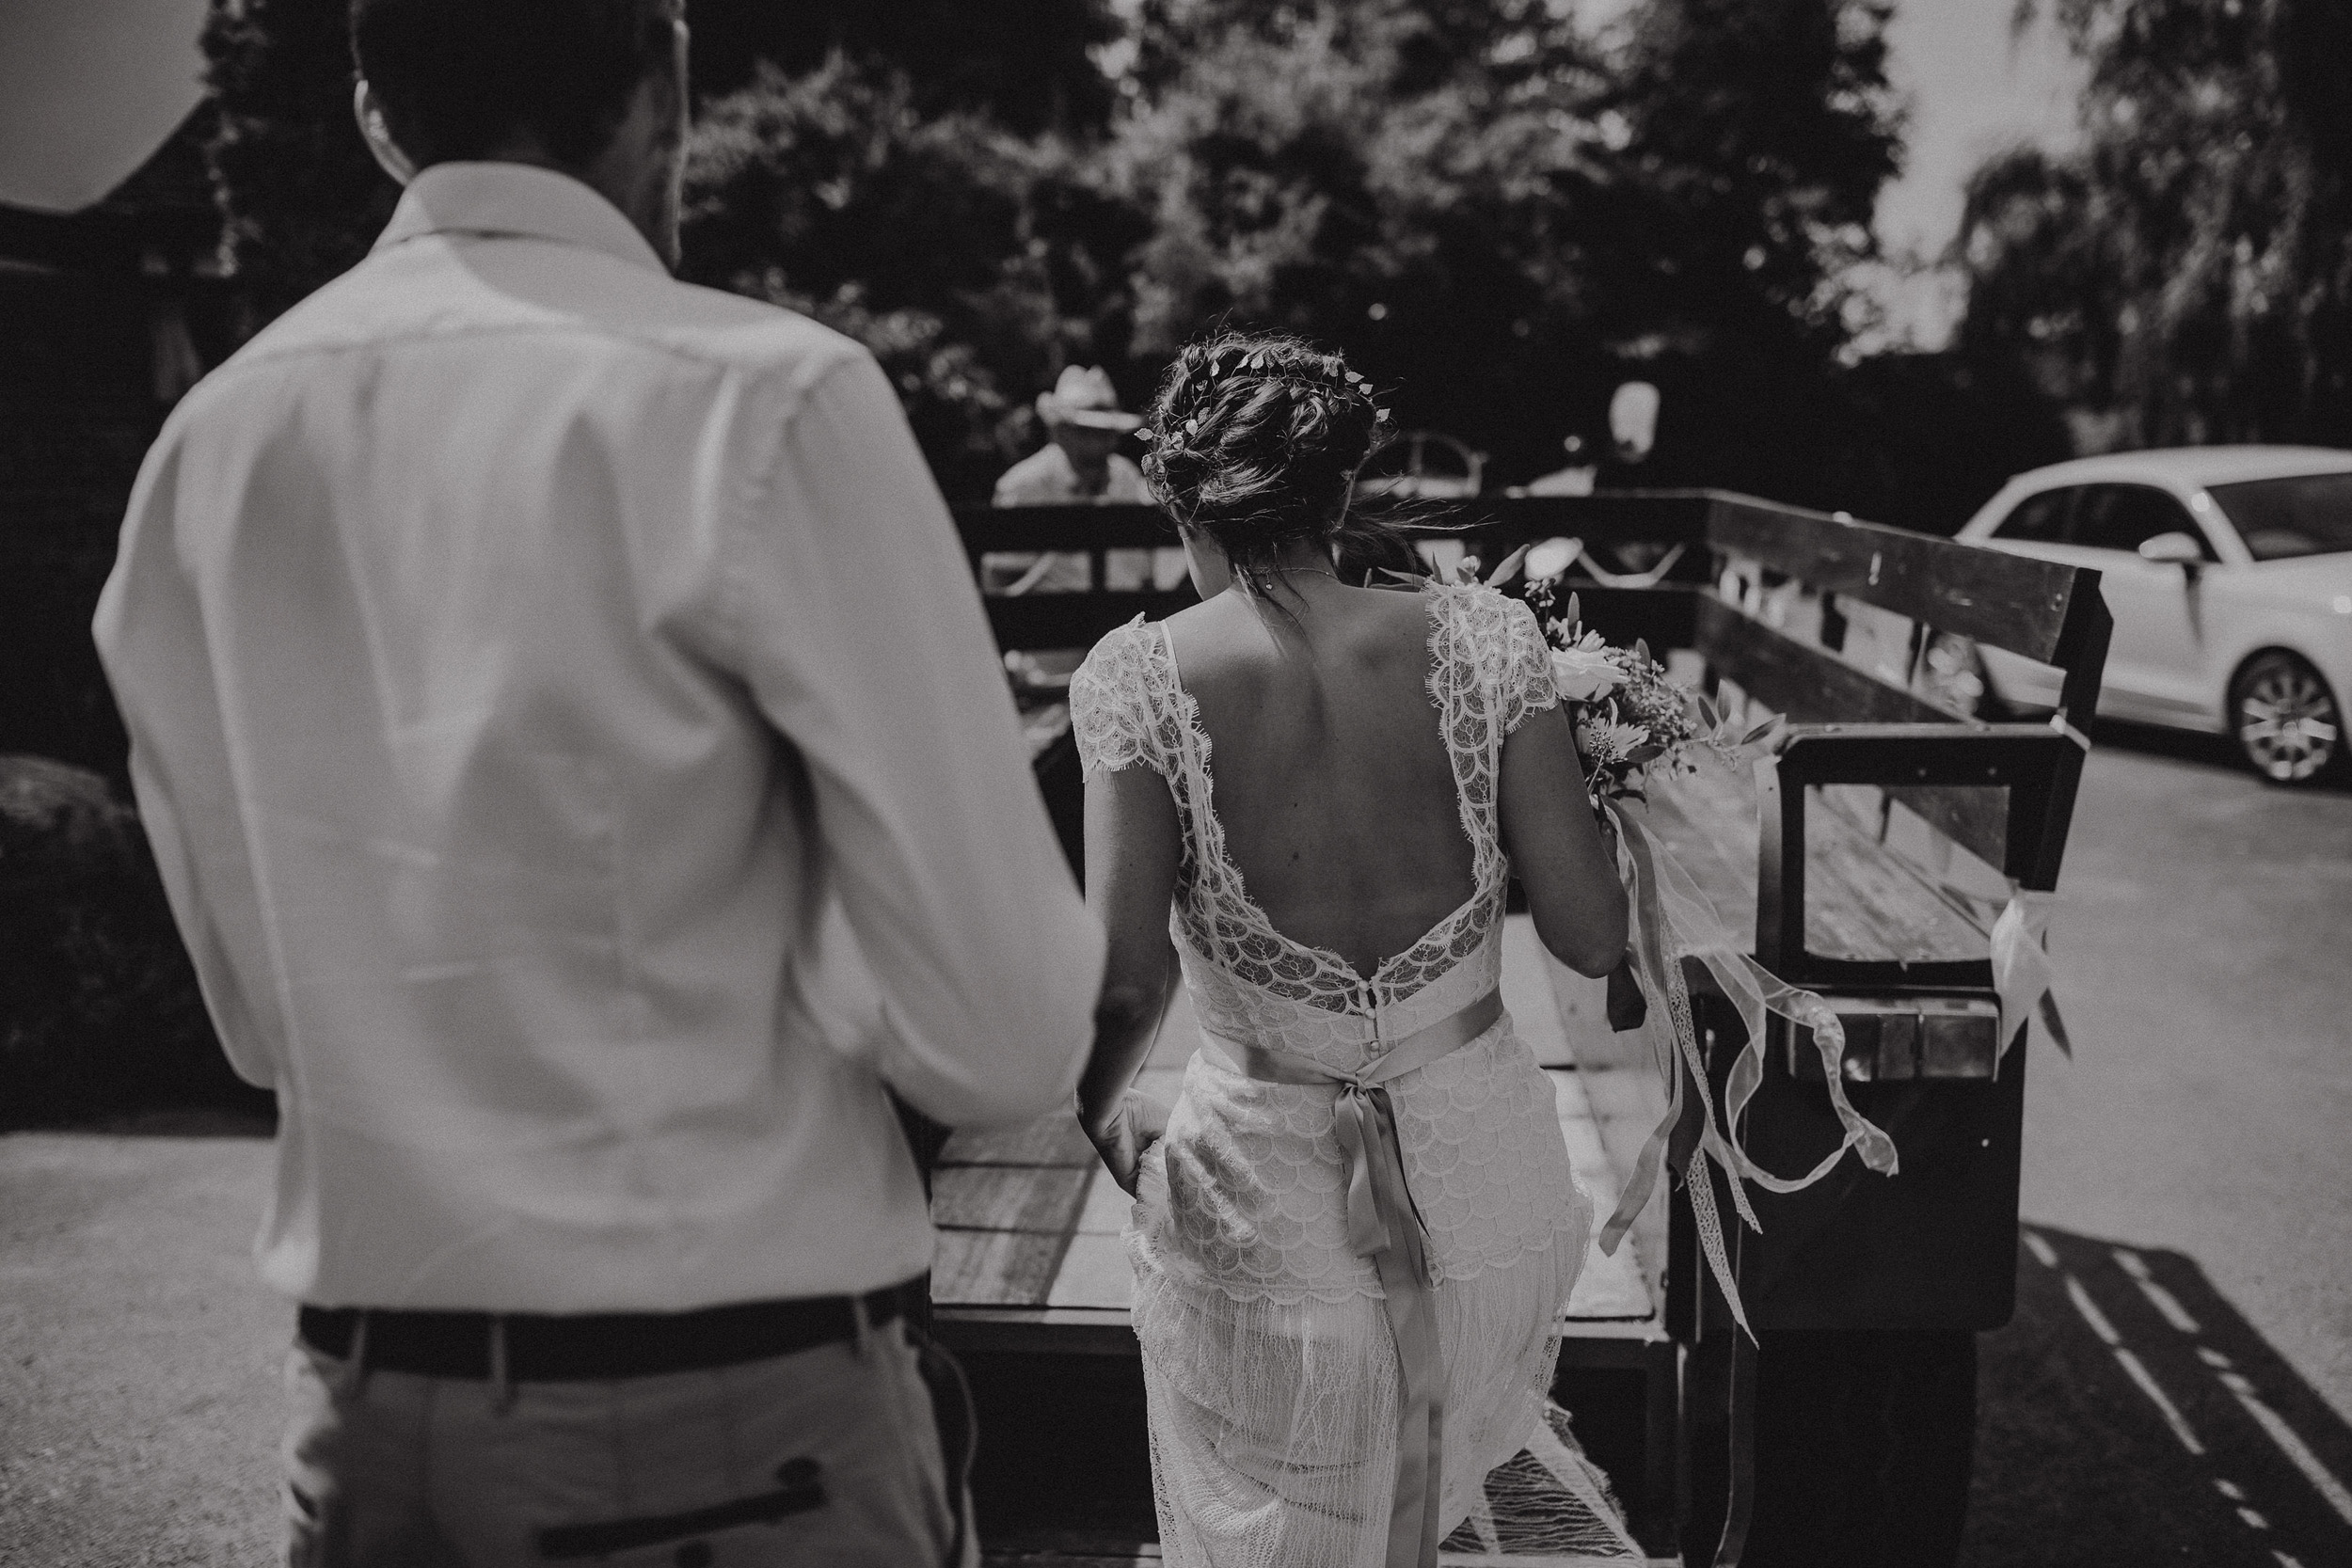 Martha-Laid-Back-Garden-Wedding-Lace-Wedding-Dress-Bohemian-Kate-Beaumont-9.jpg